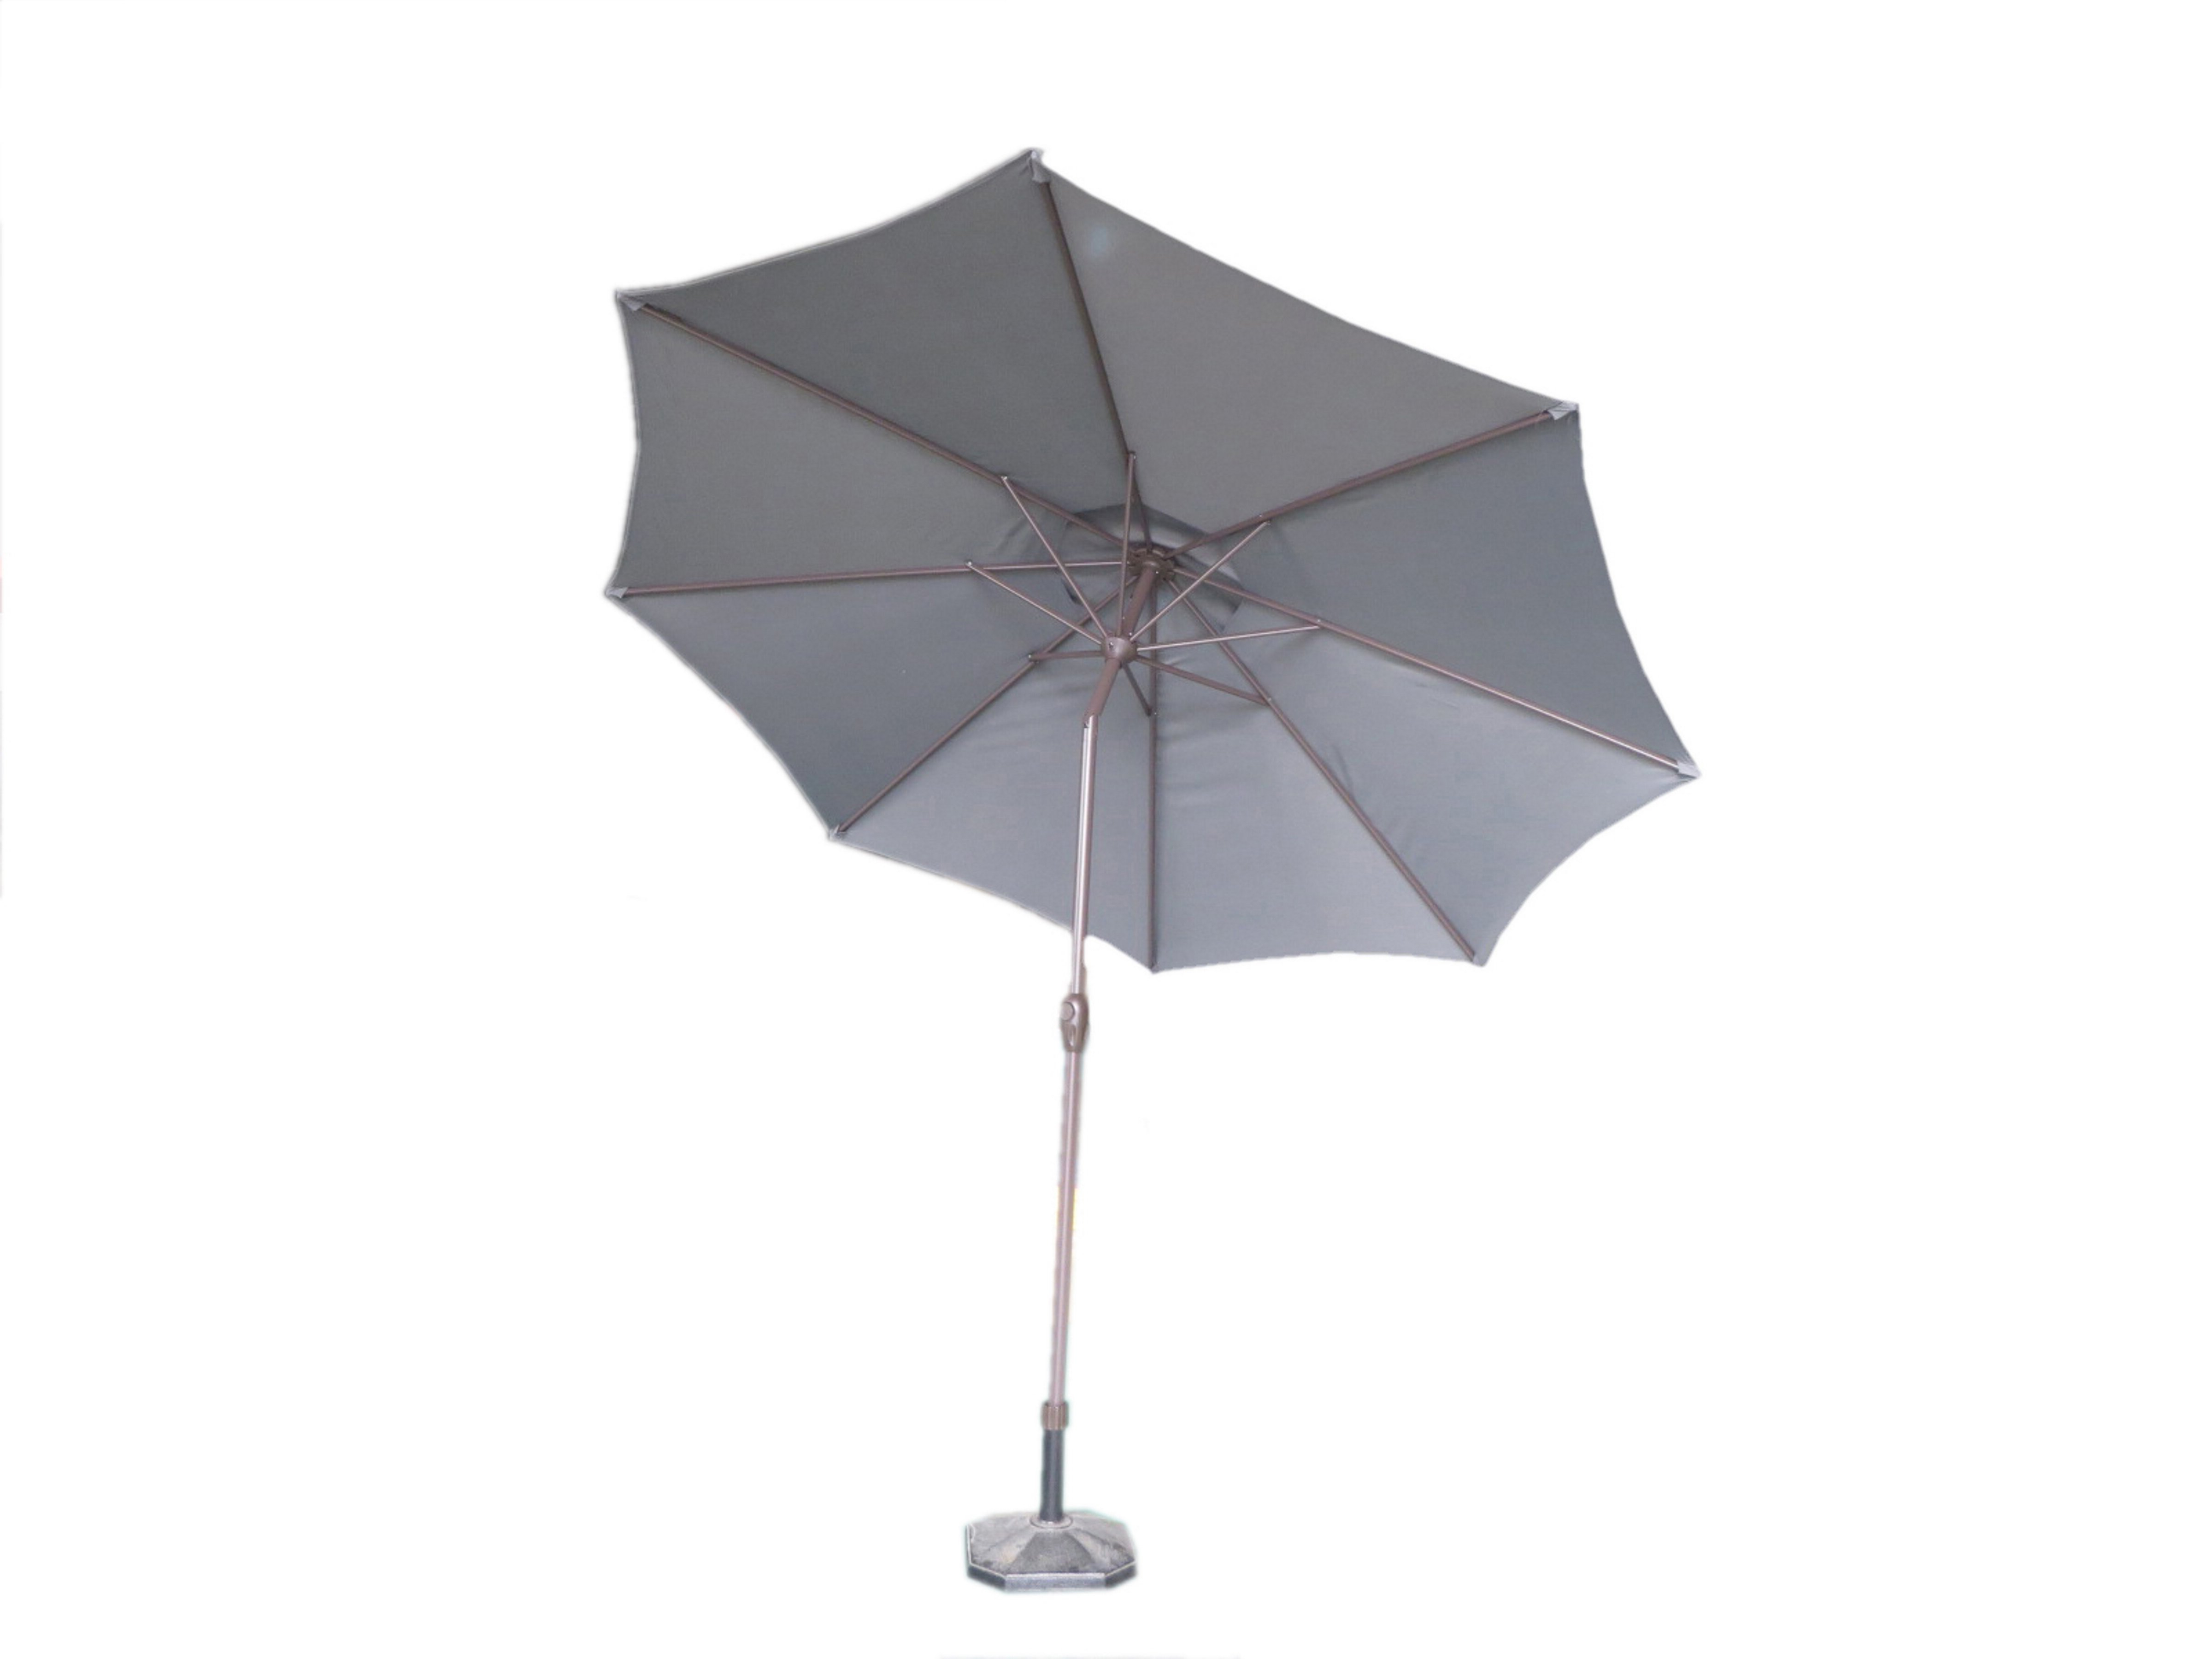 Fashionable Havant Market Umbrellas With Regard To Lodd Market Umbrella (View 7 of 20)